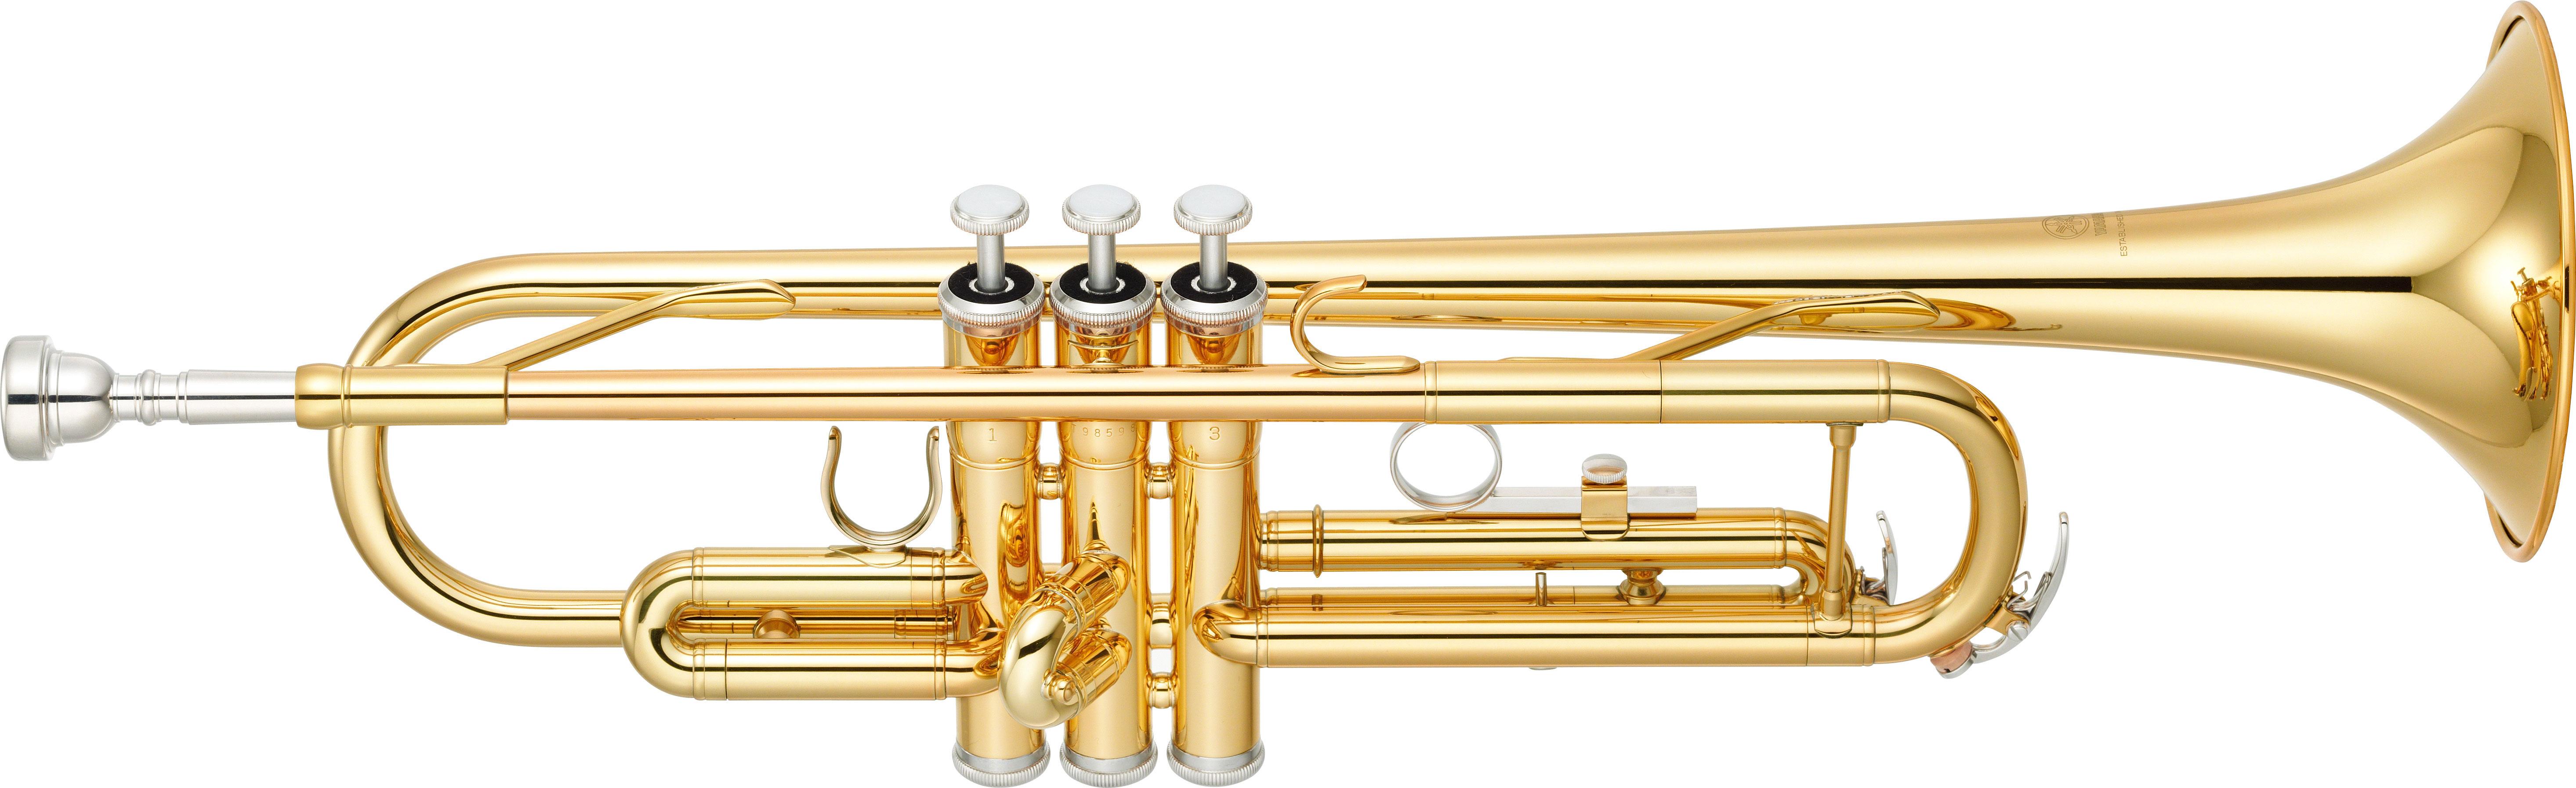 Trompette Yamaha Ytr